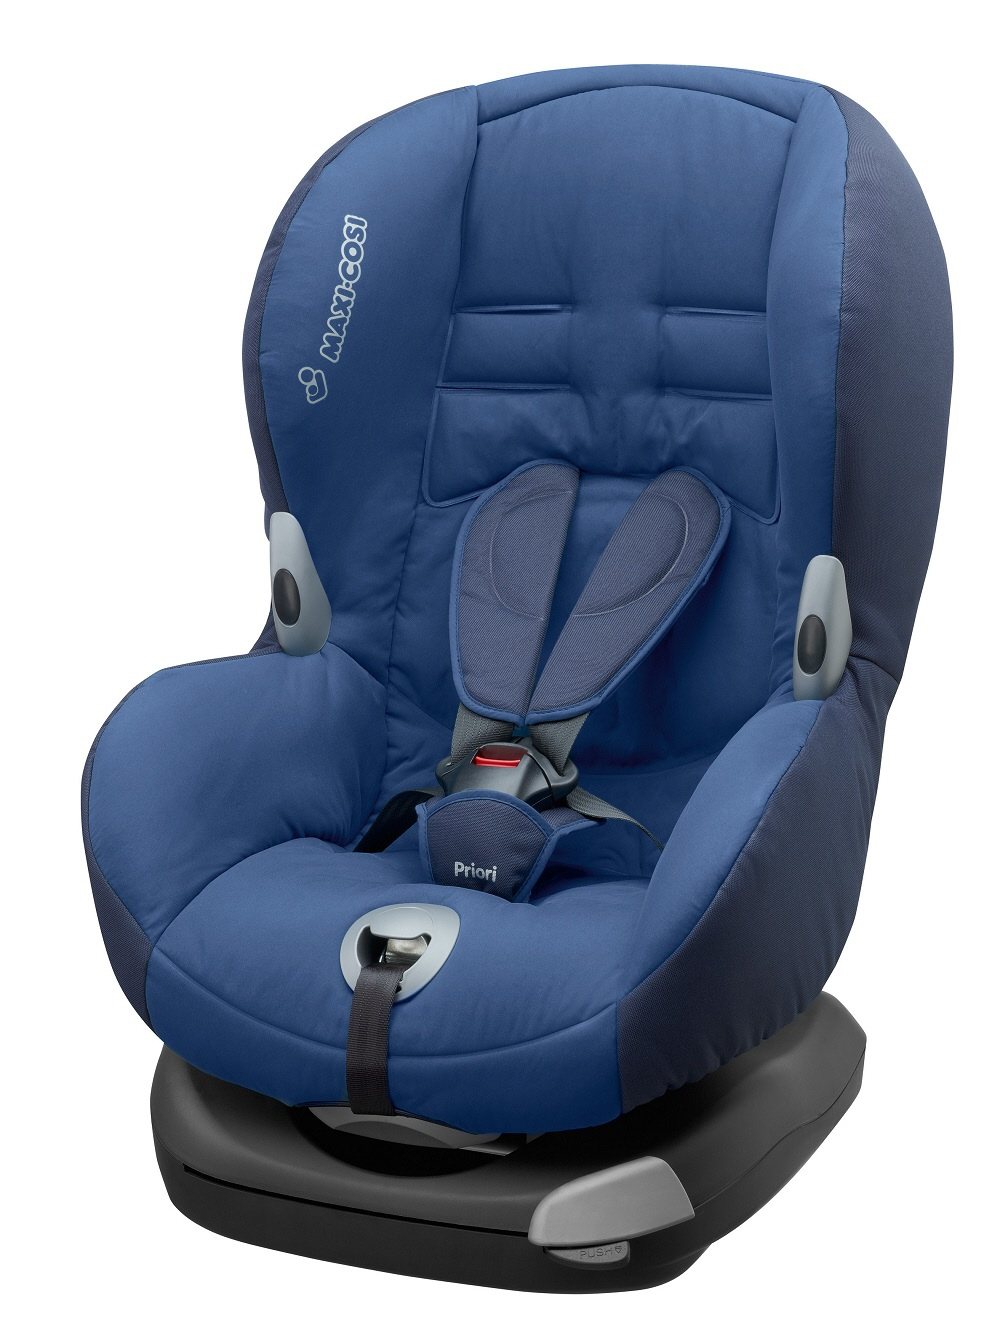 maxi cosi child car seat priori xp 2015 blue night buy. Black Bedroom Furniture Sets. Home Design Ideas